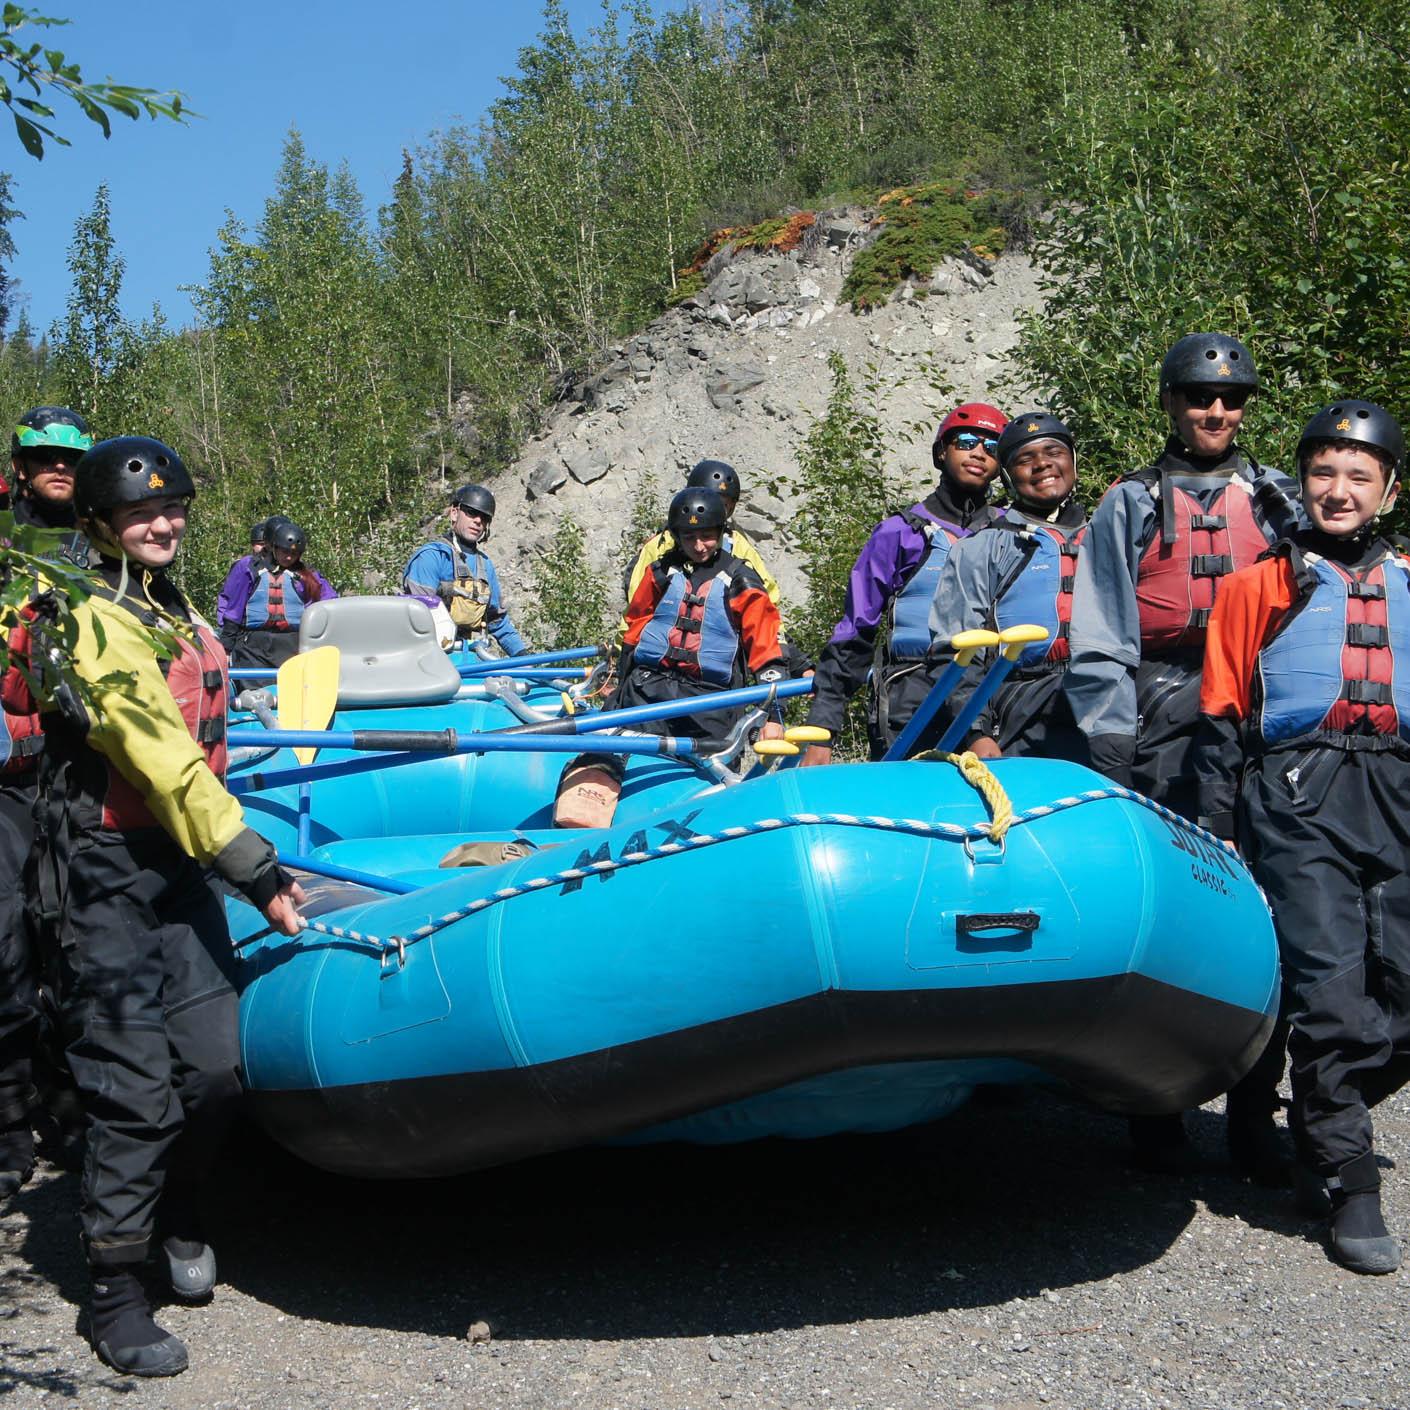 Alaska High Trails whitewater rafting